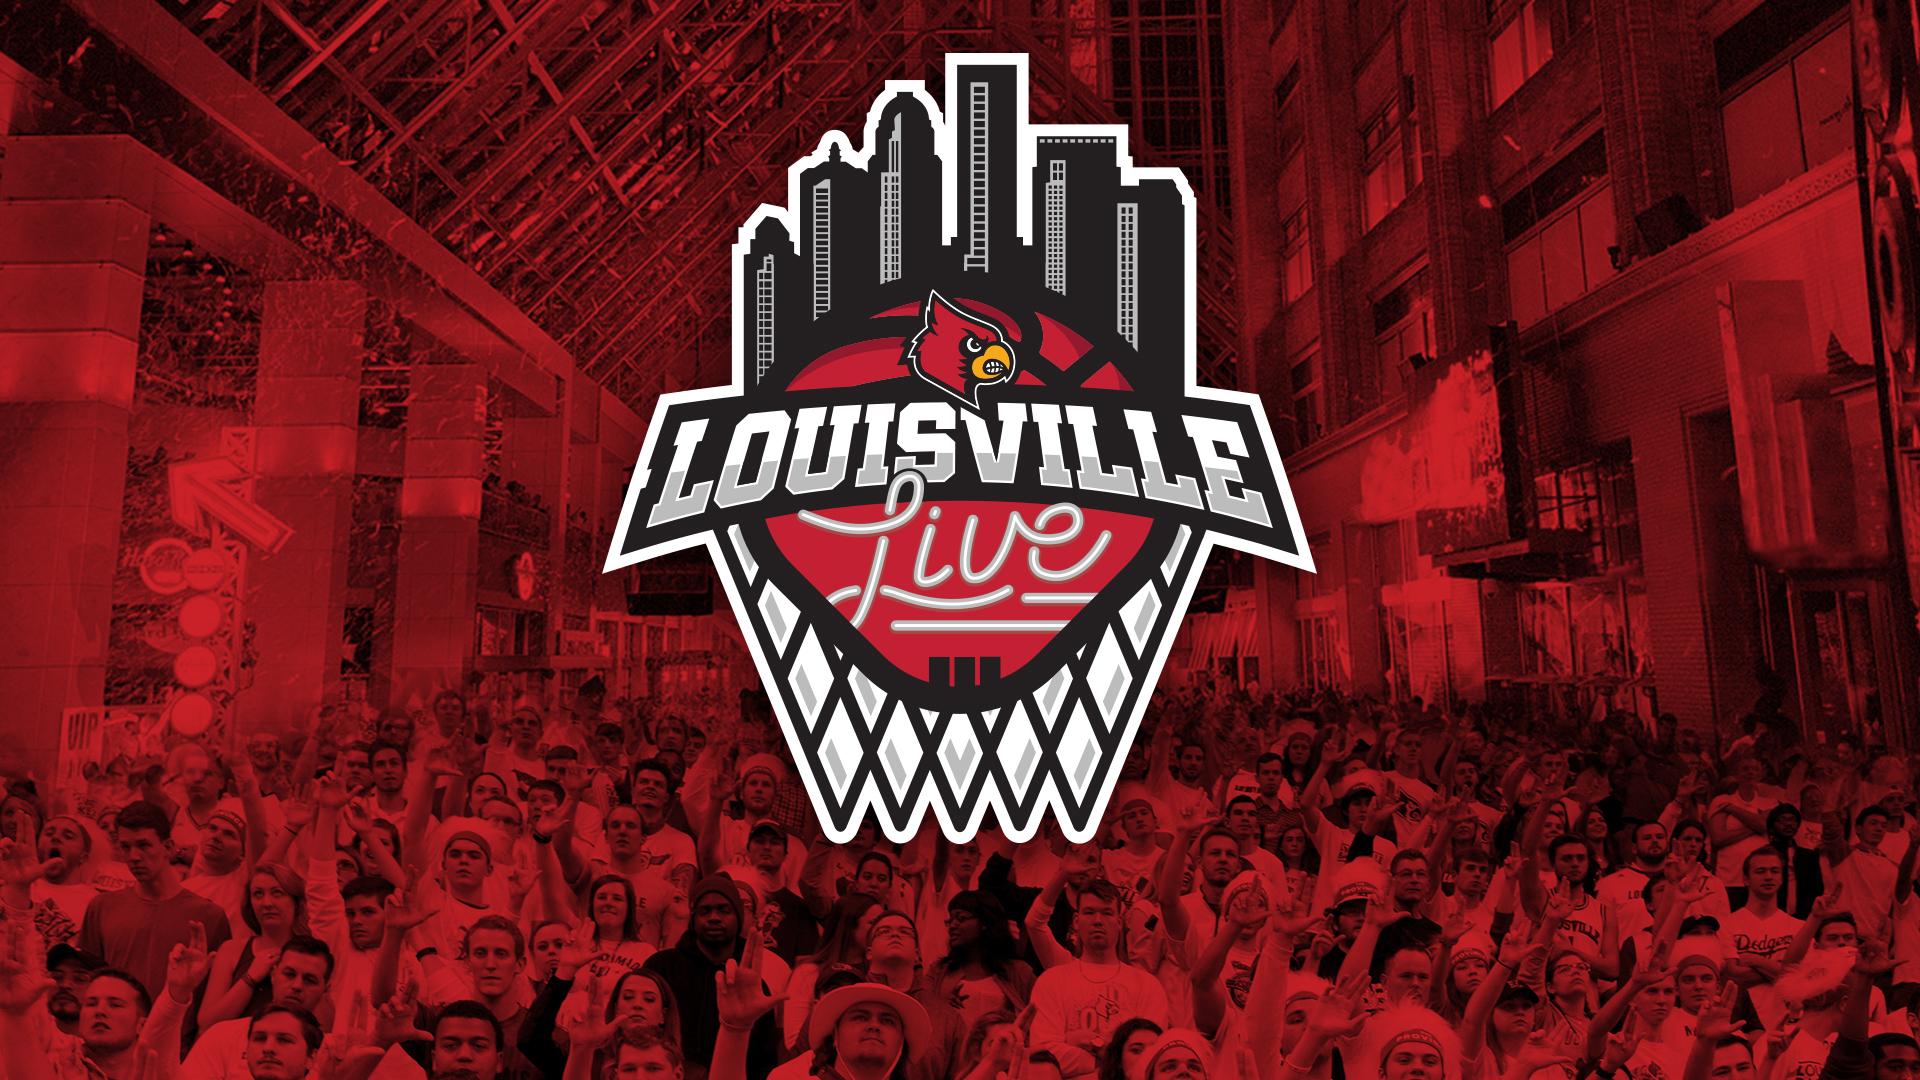 A Red - Louisville Live Basketball , HD Wallpaper & Backgrounds